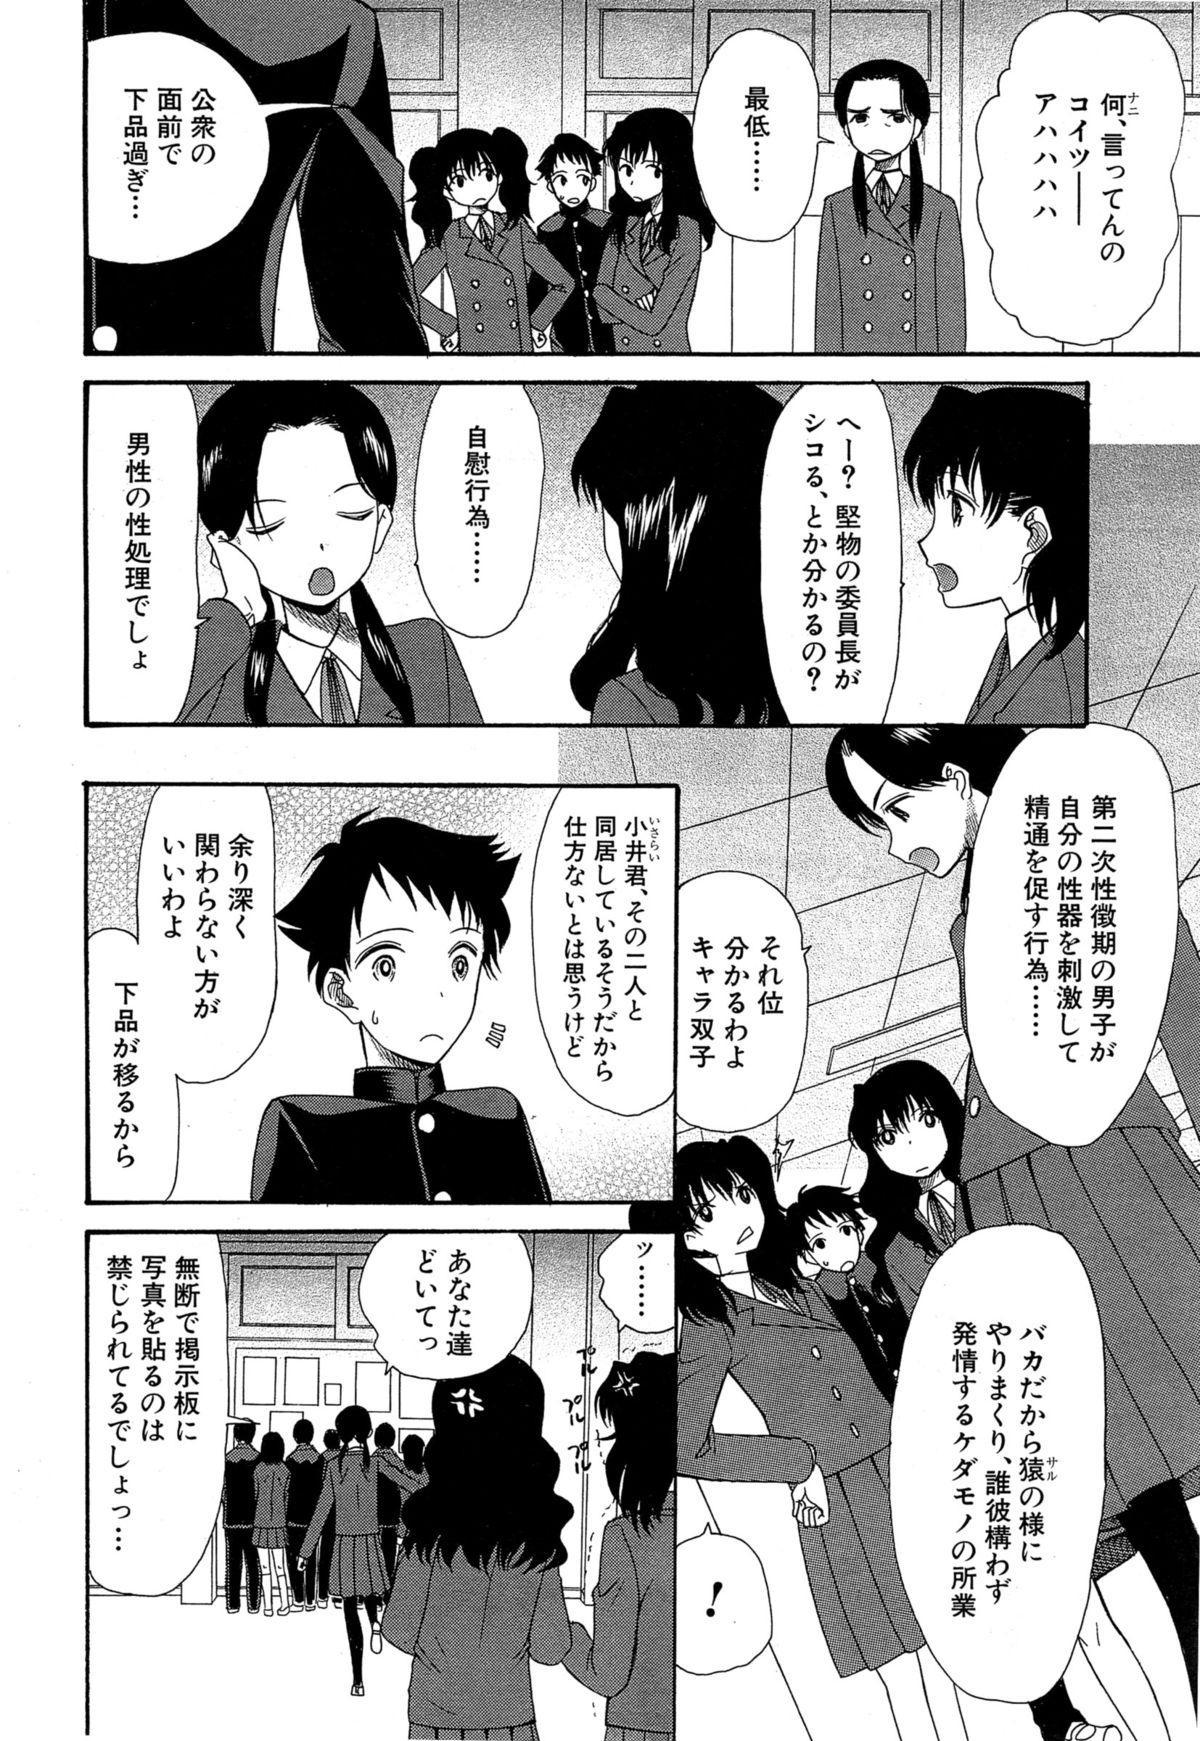 Kawaiku Natte Omocha ni Natte 33